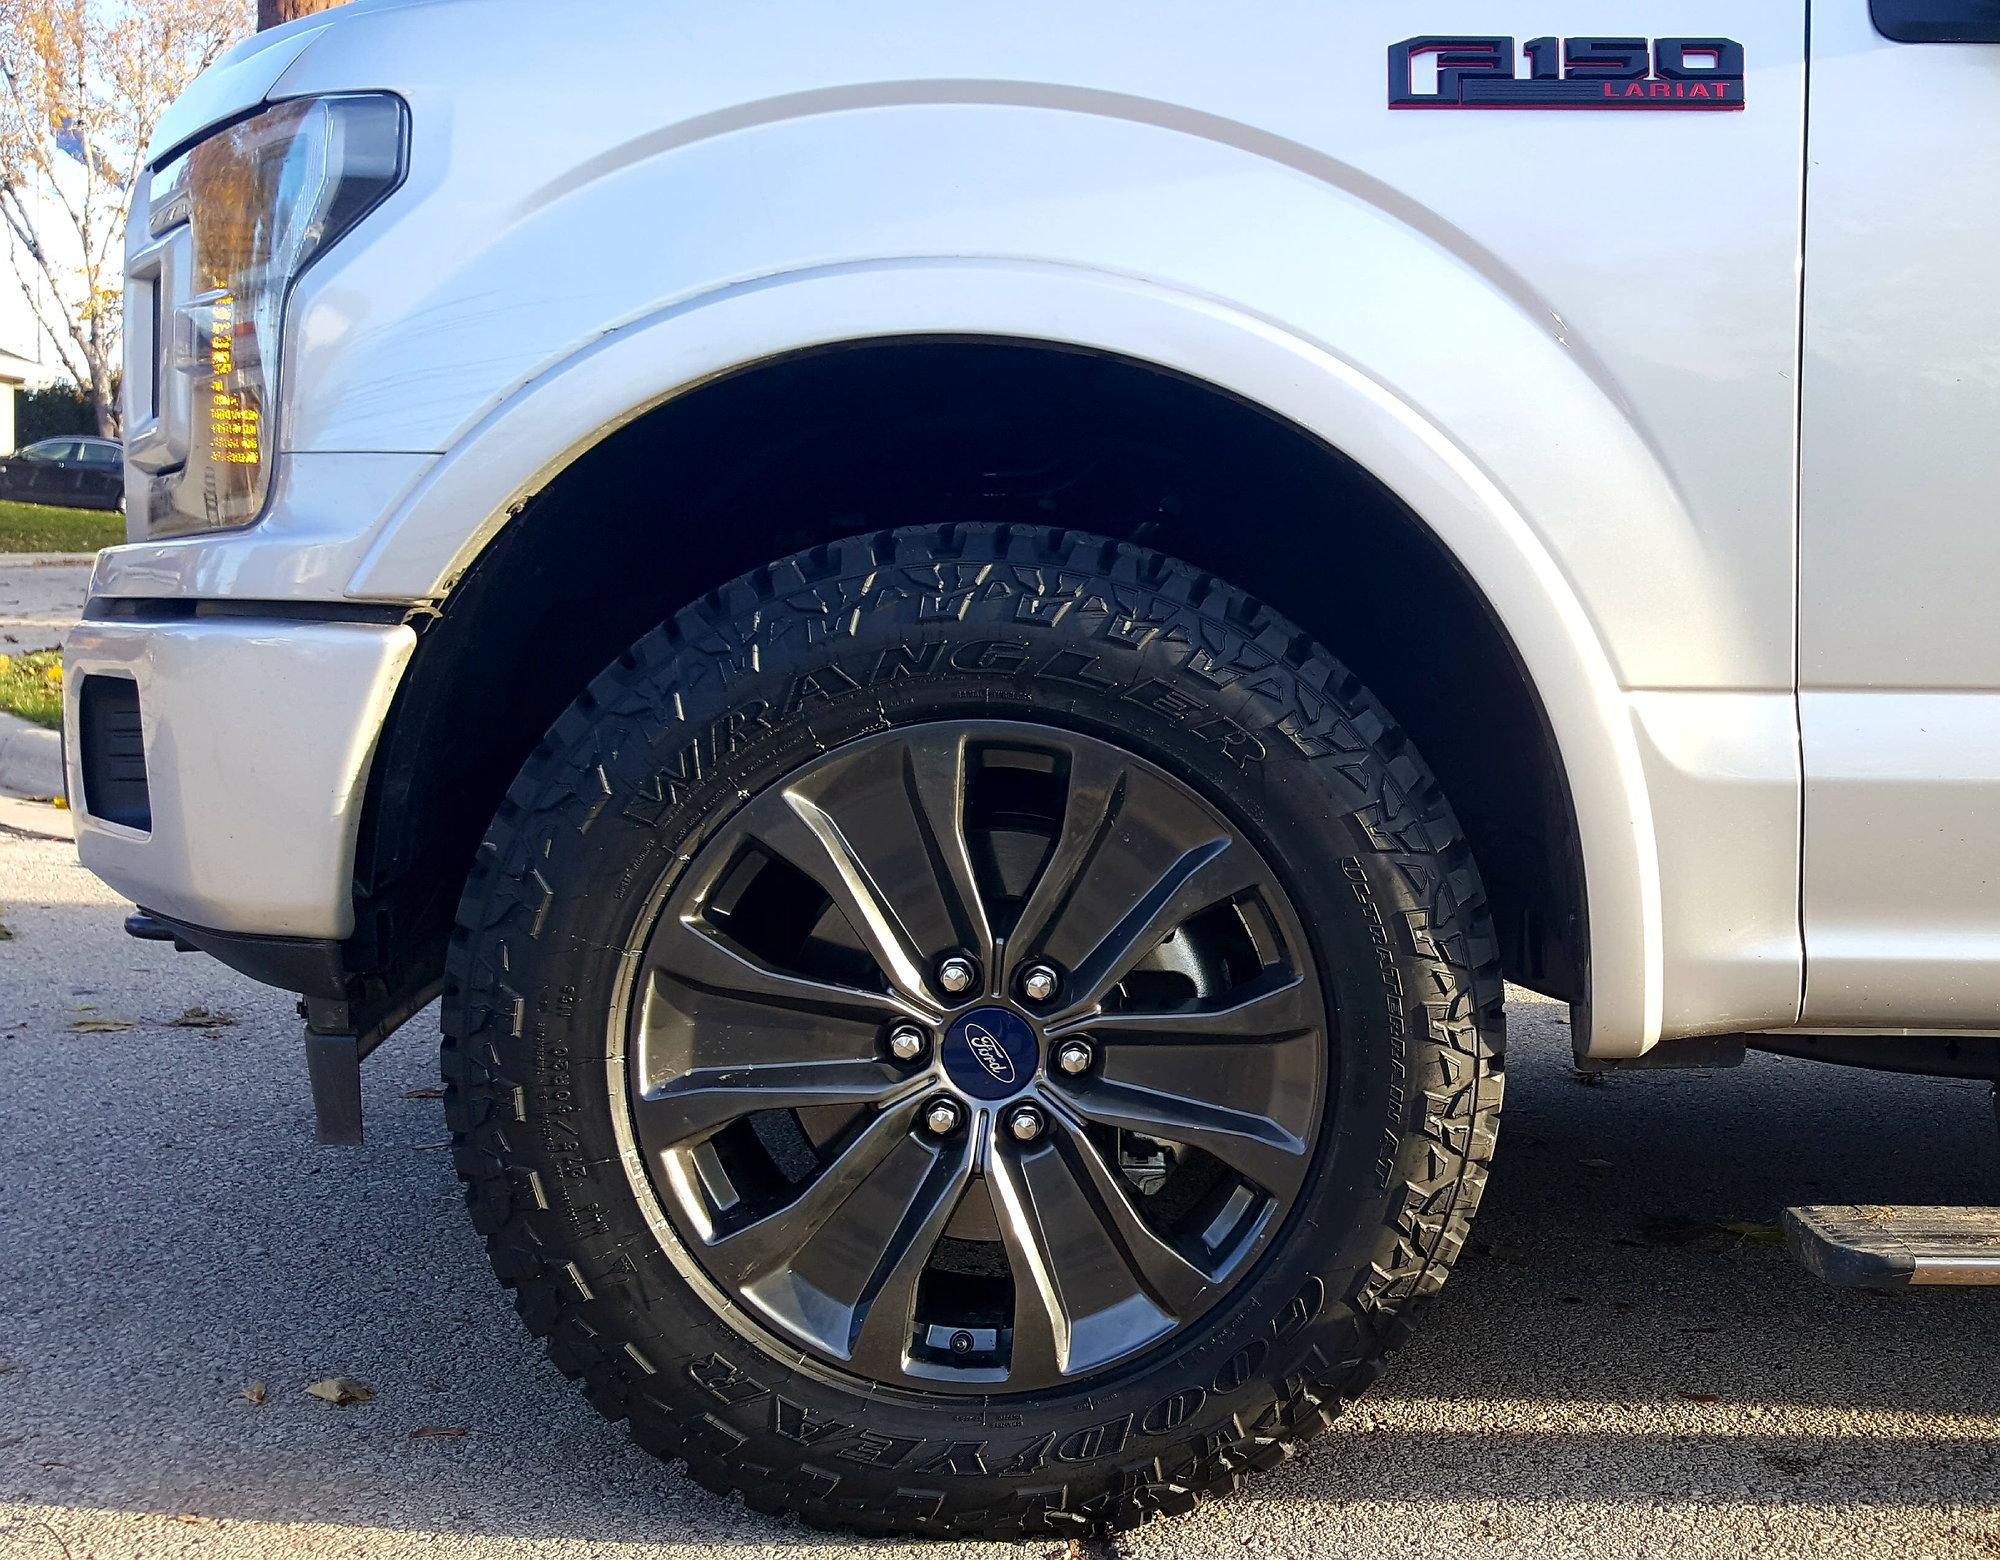 Goodyear Ultraterrain Tires Ford F150 Forum Community